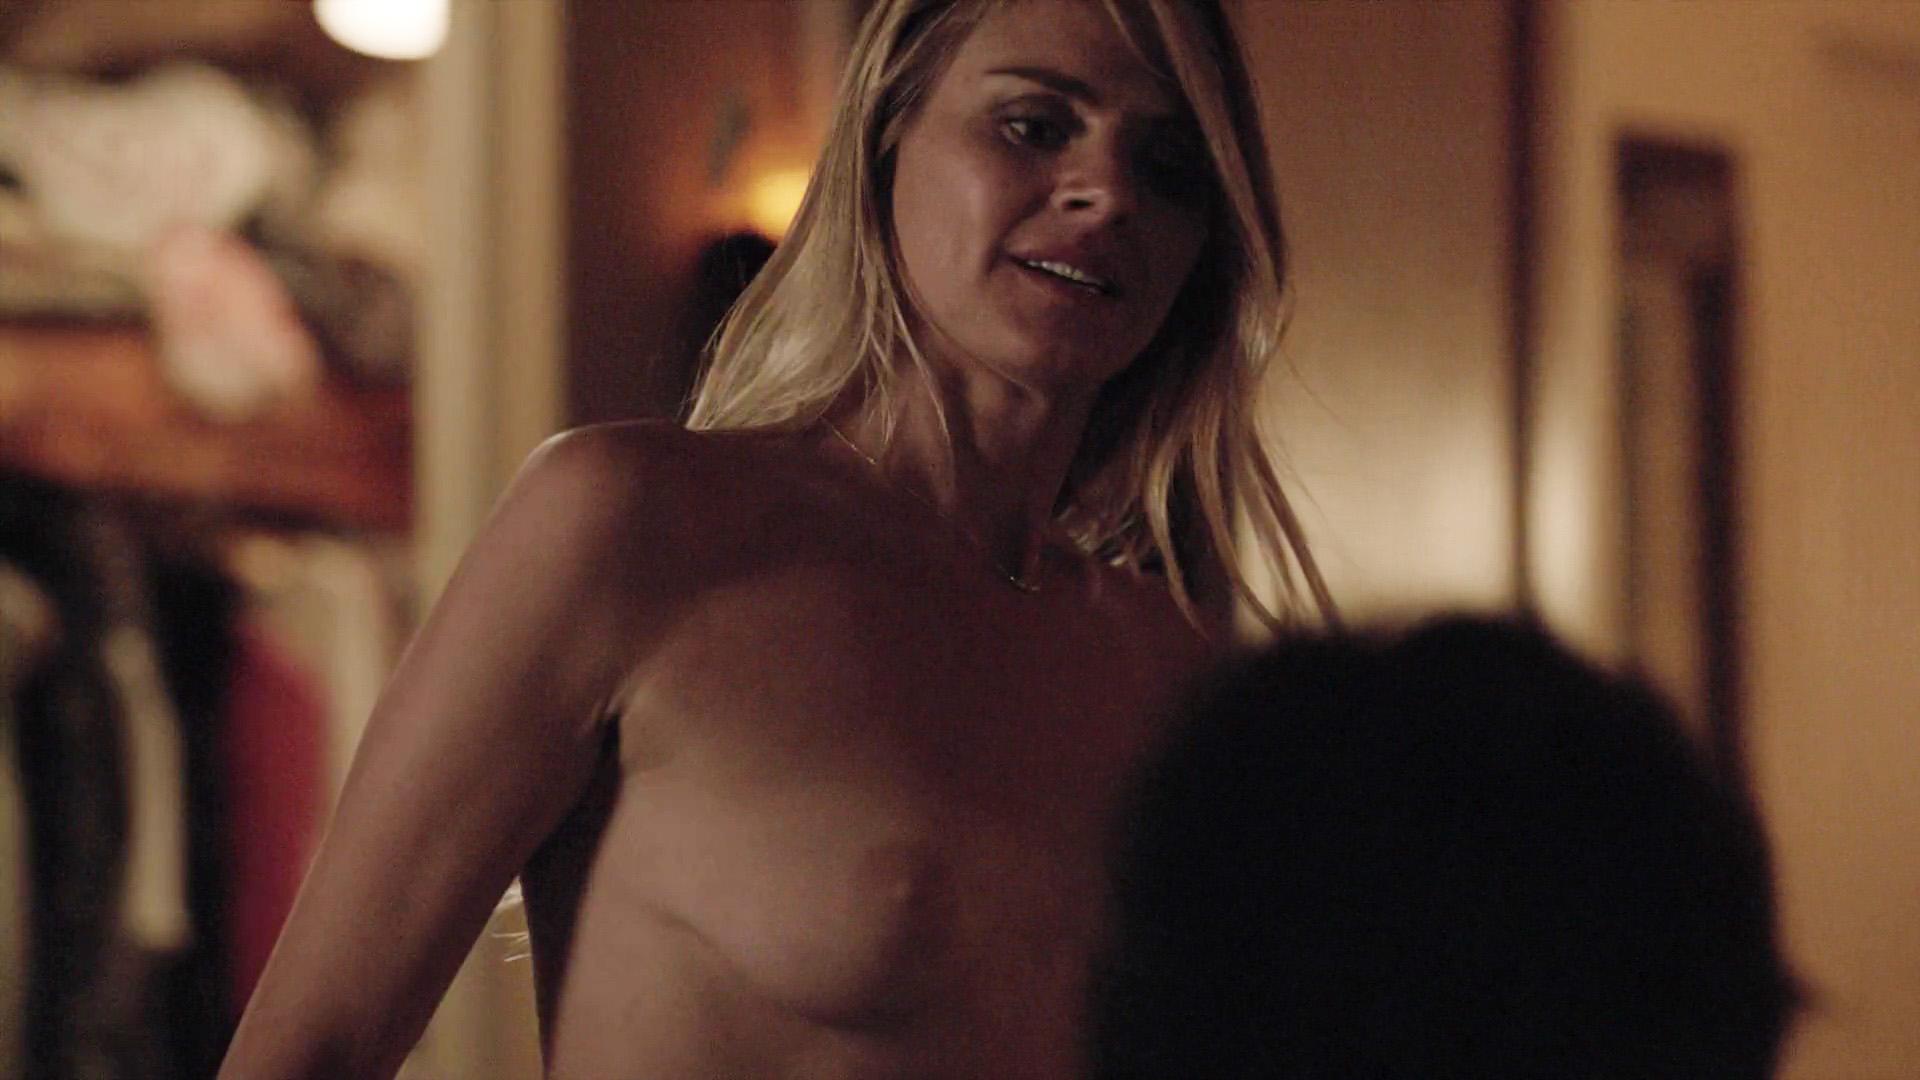 Eliza coupe nude